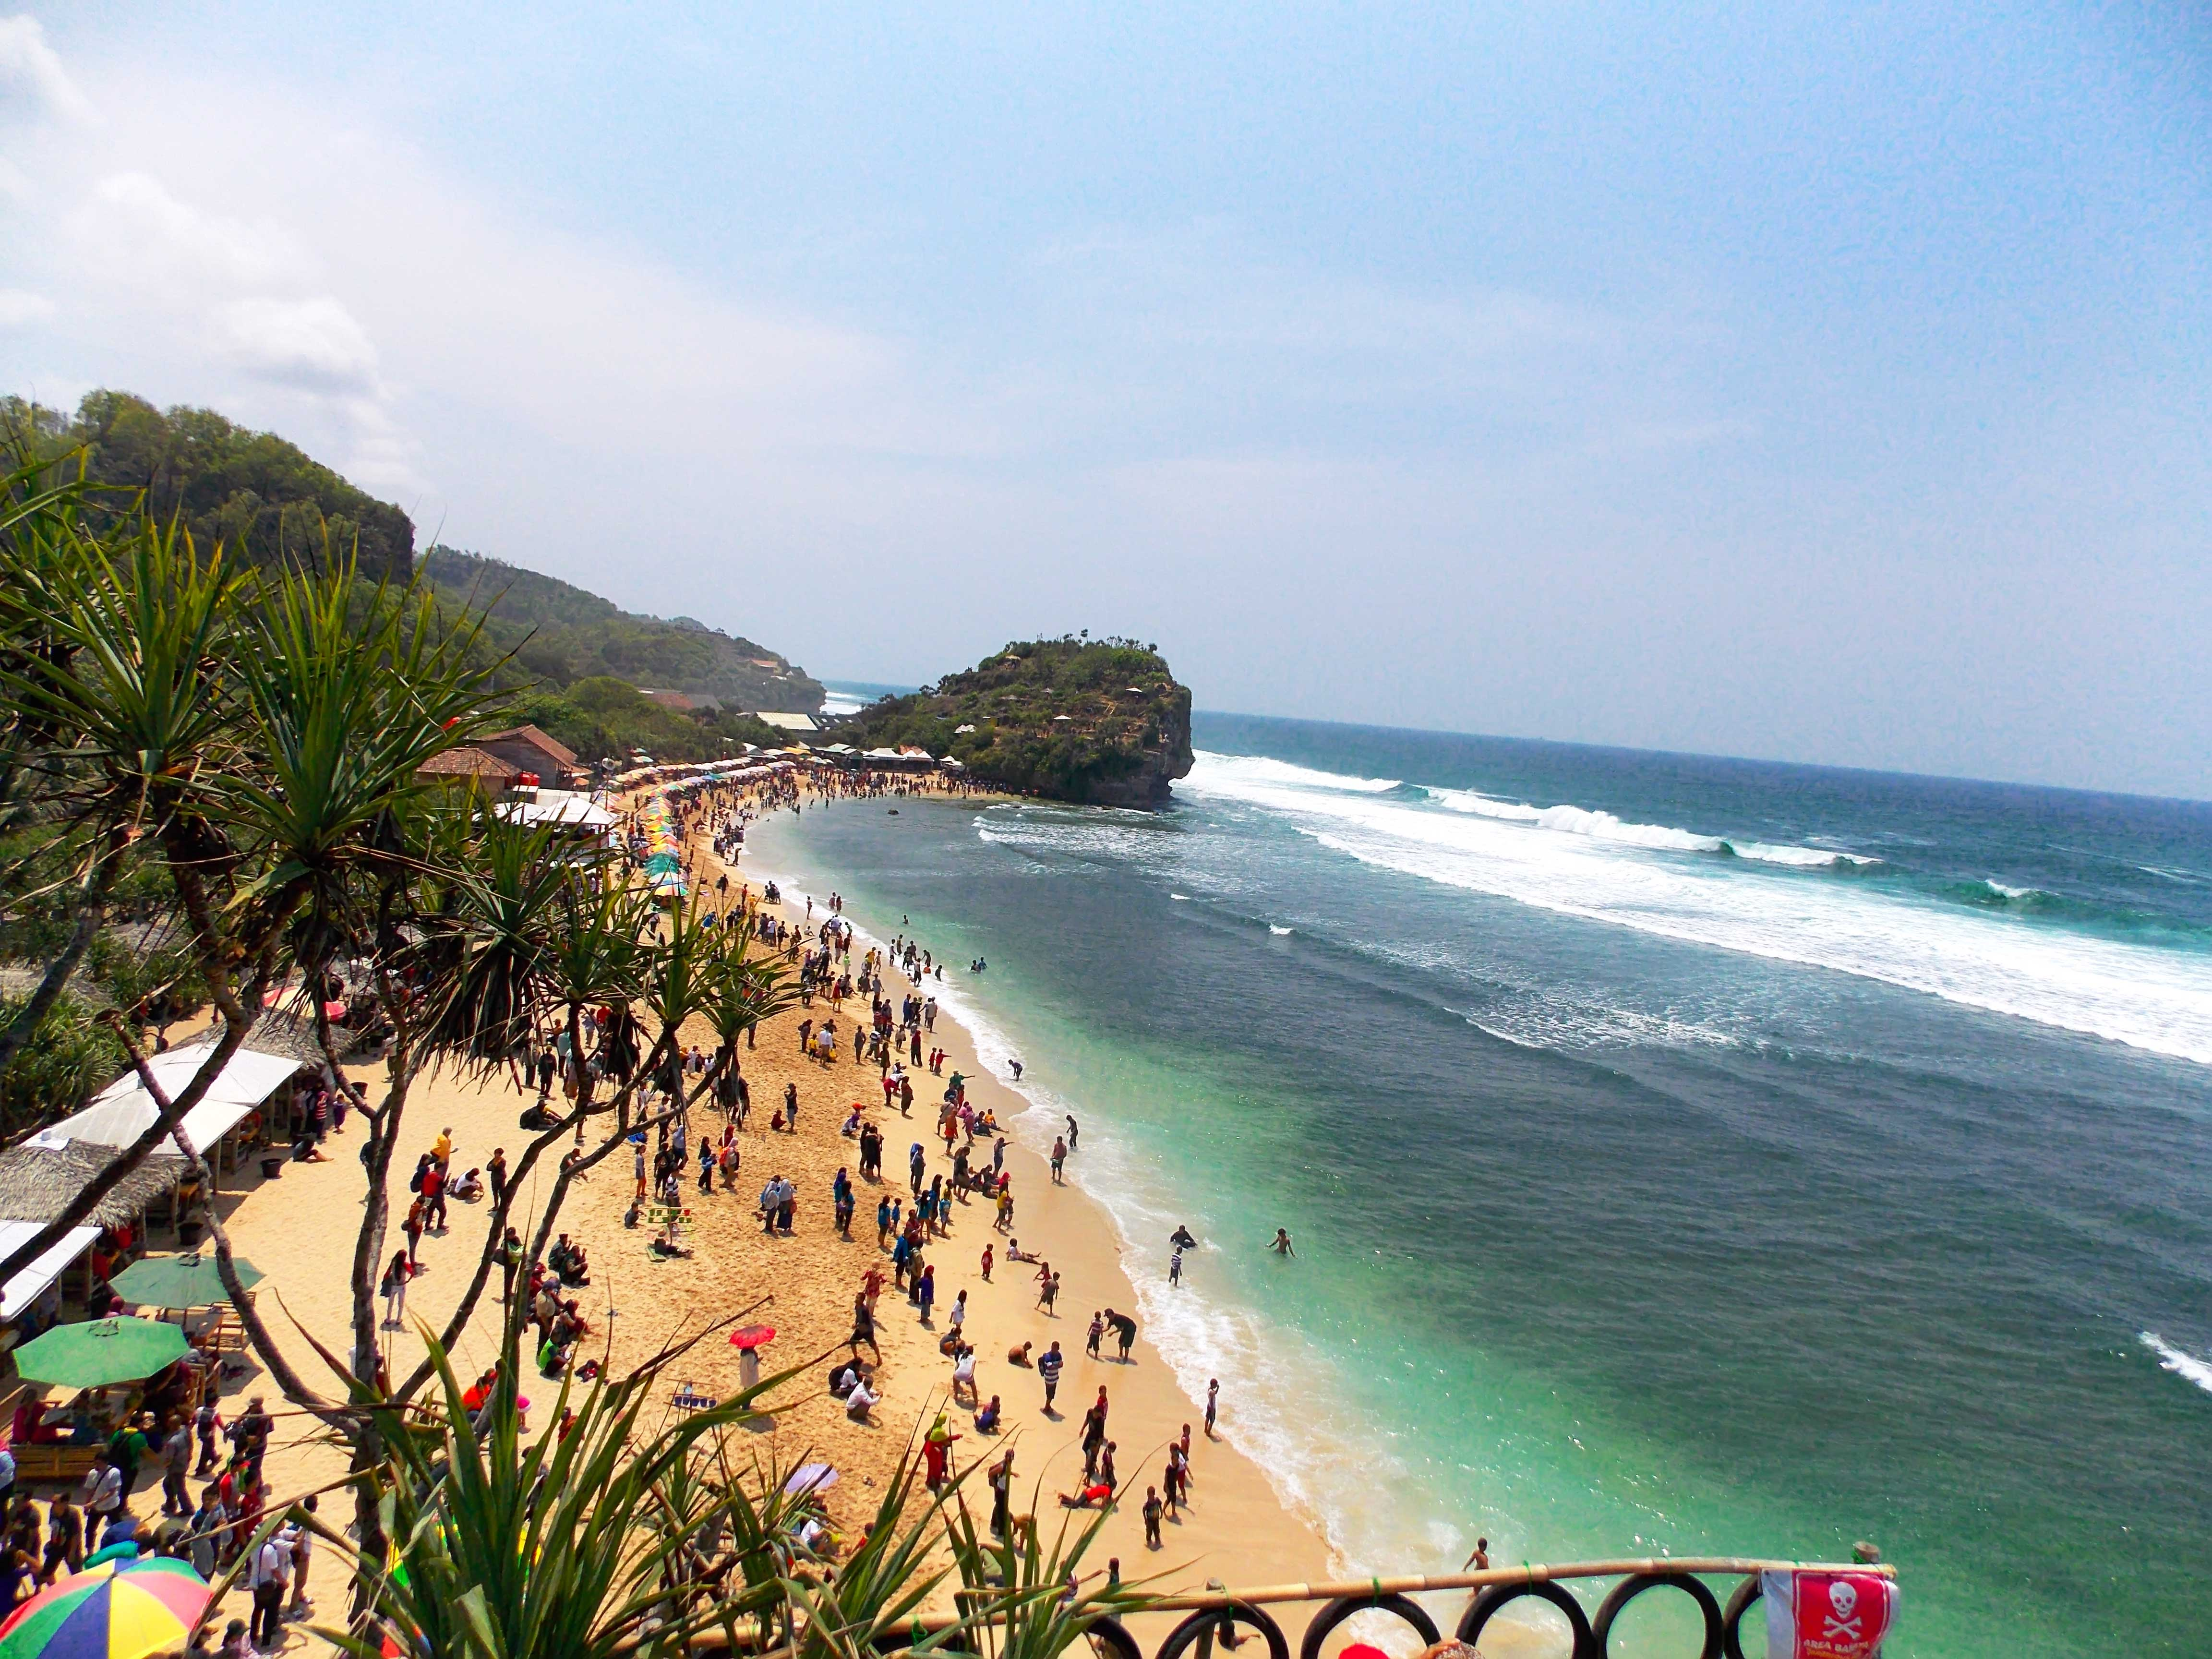 Pantai Indrayanti, Gunung Kidul, Yogyakarta